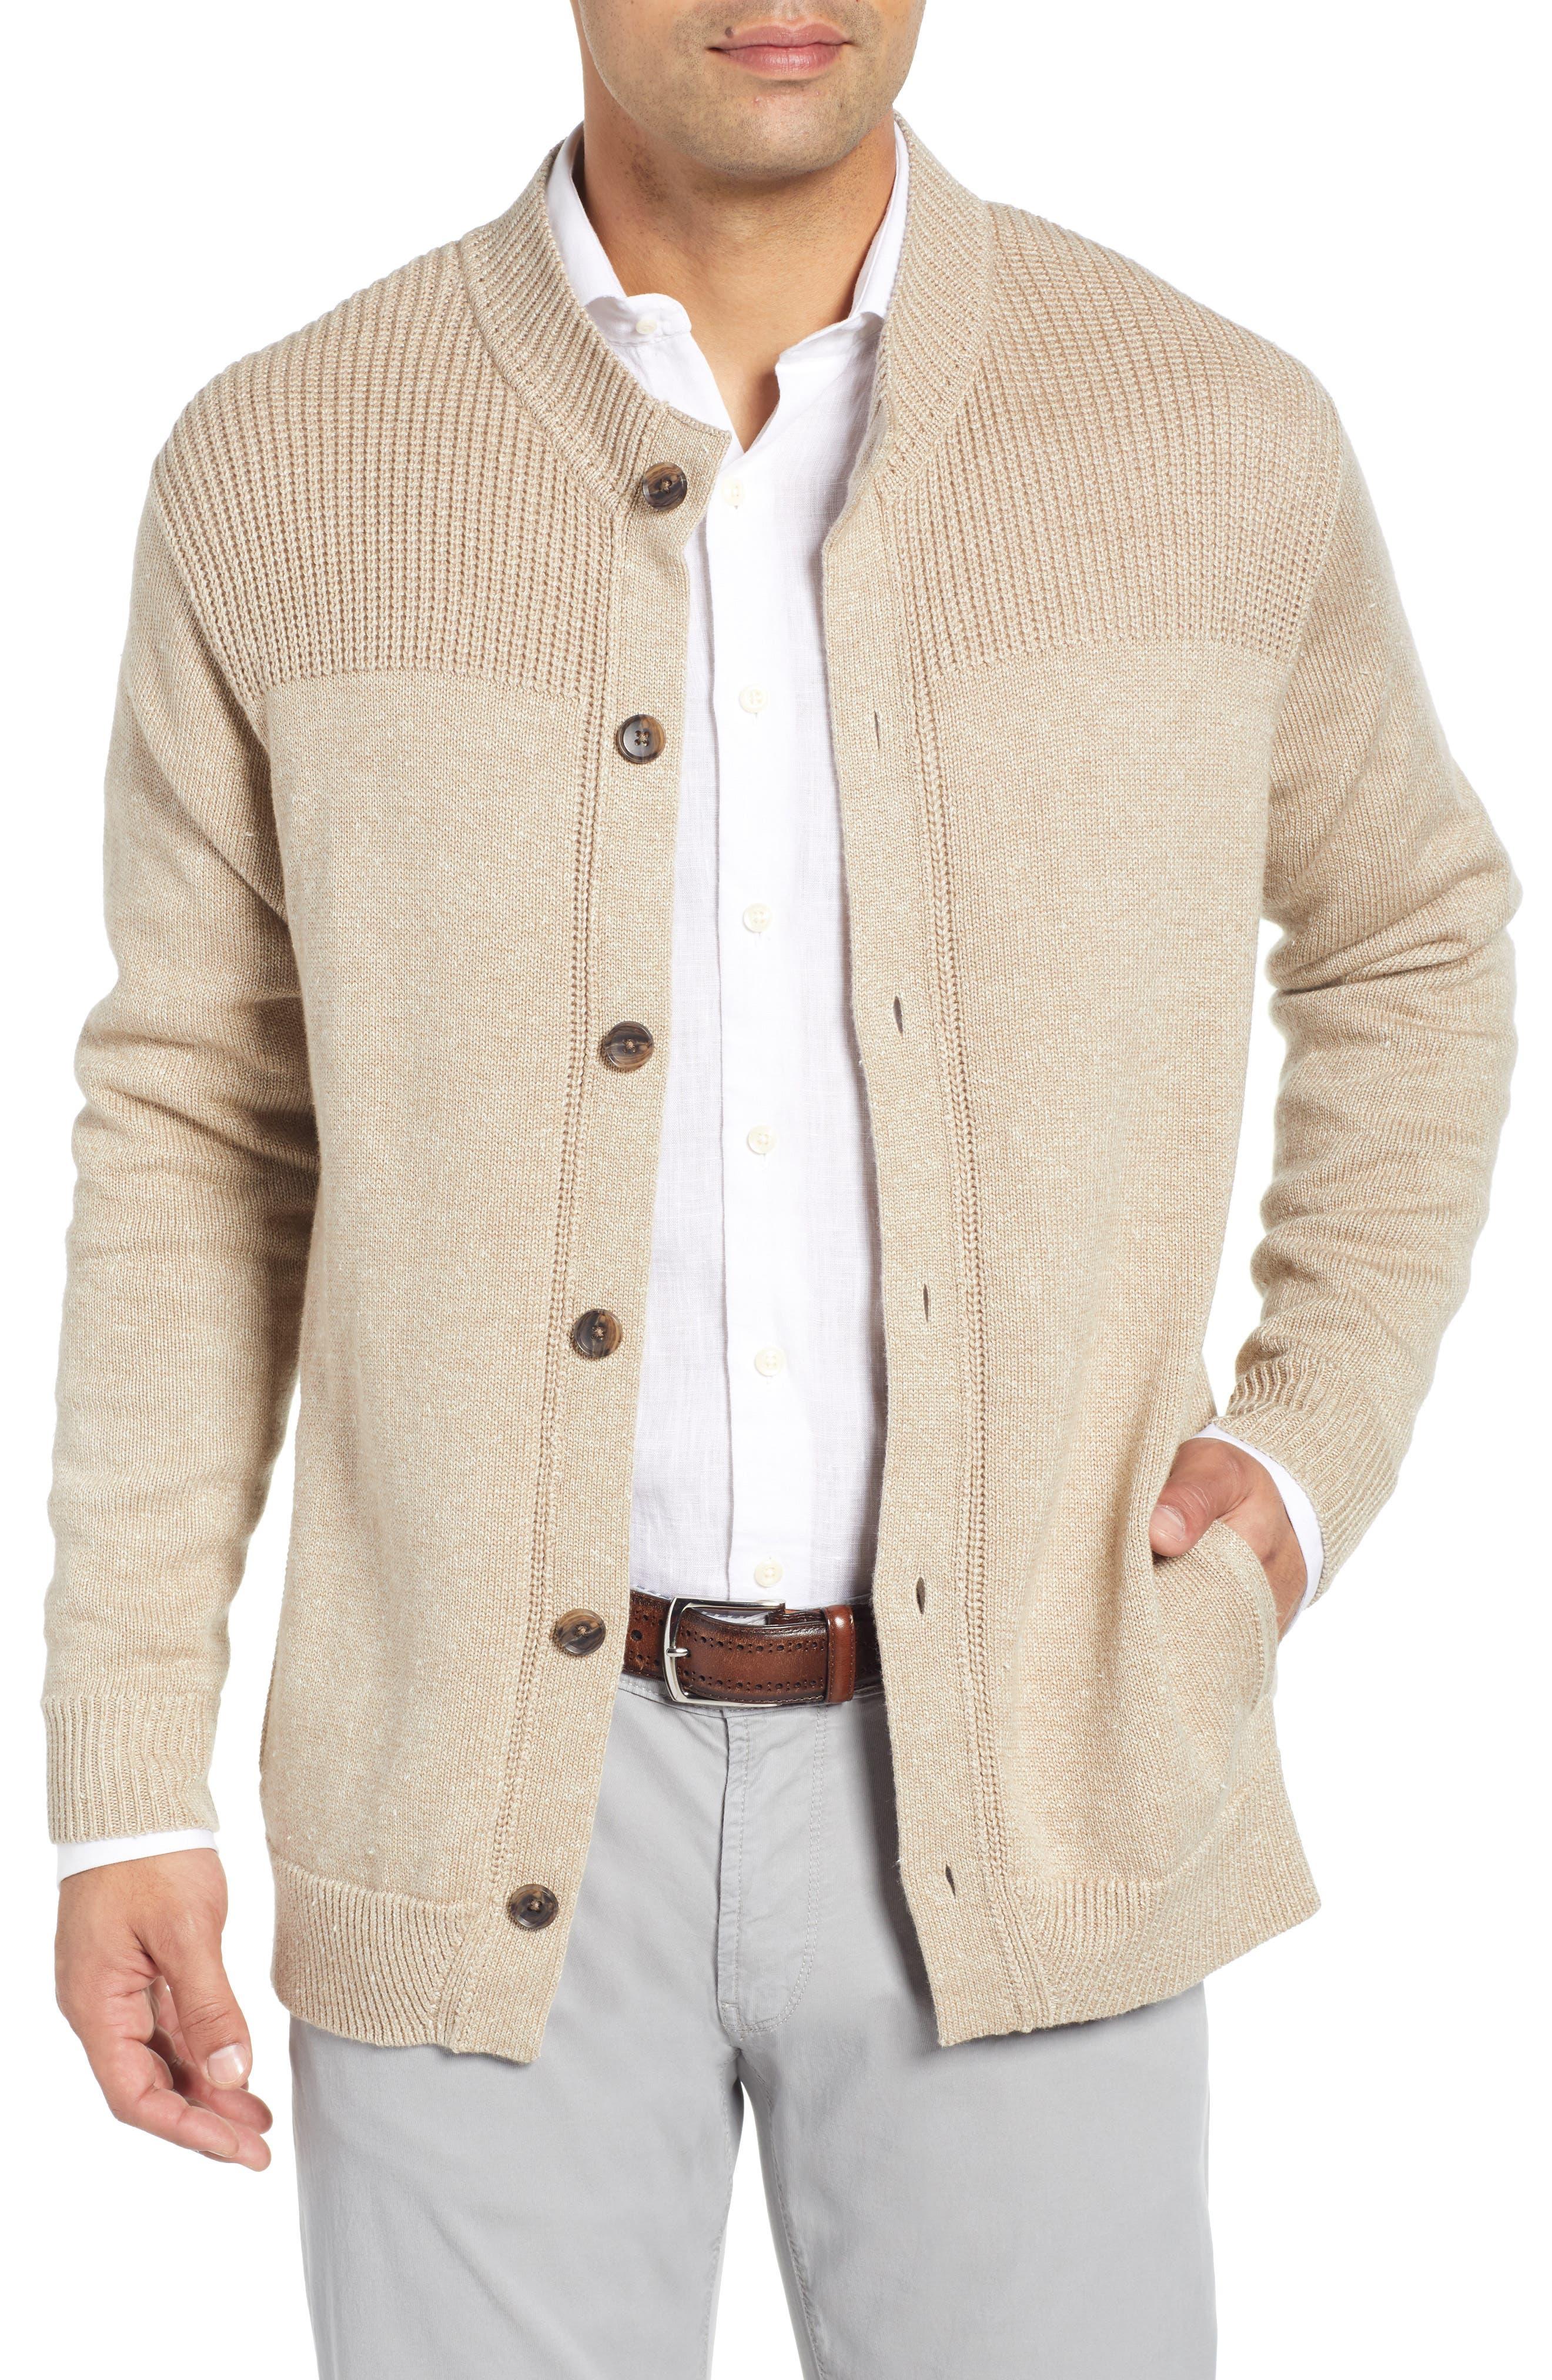 PETER MILLAR Beech Wood Classic Fit Cardigan, Main, color, BEECH WOOD